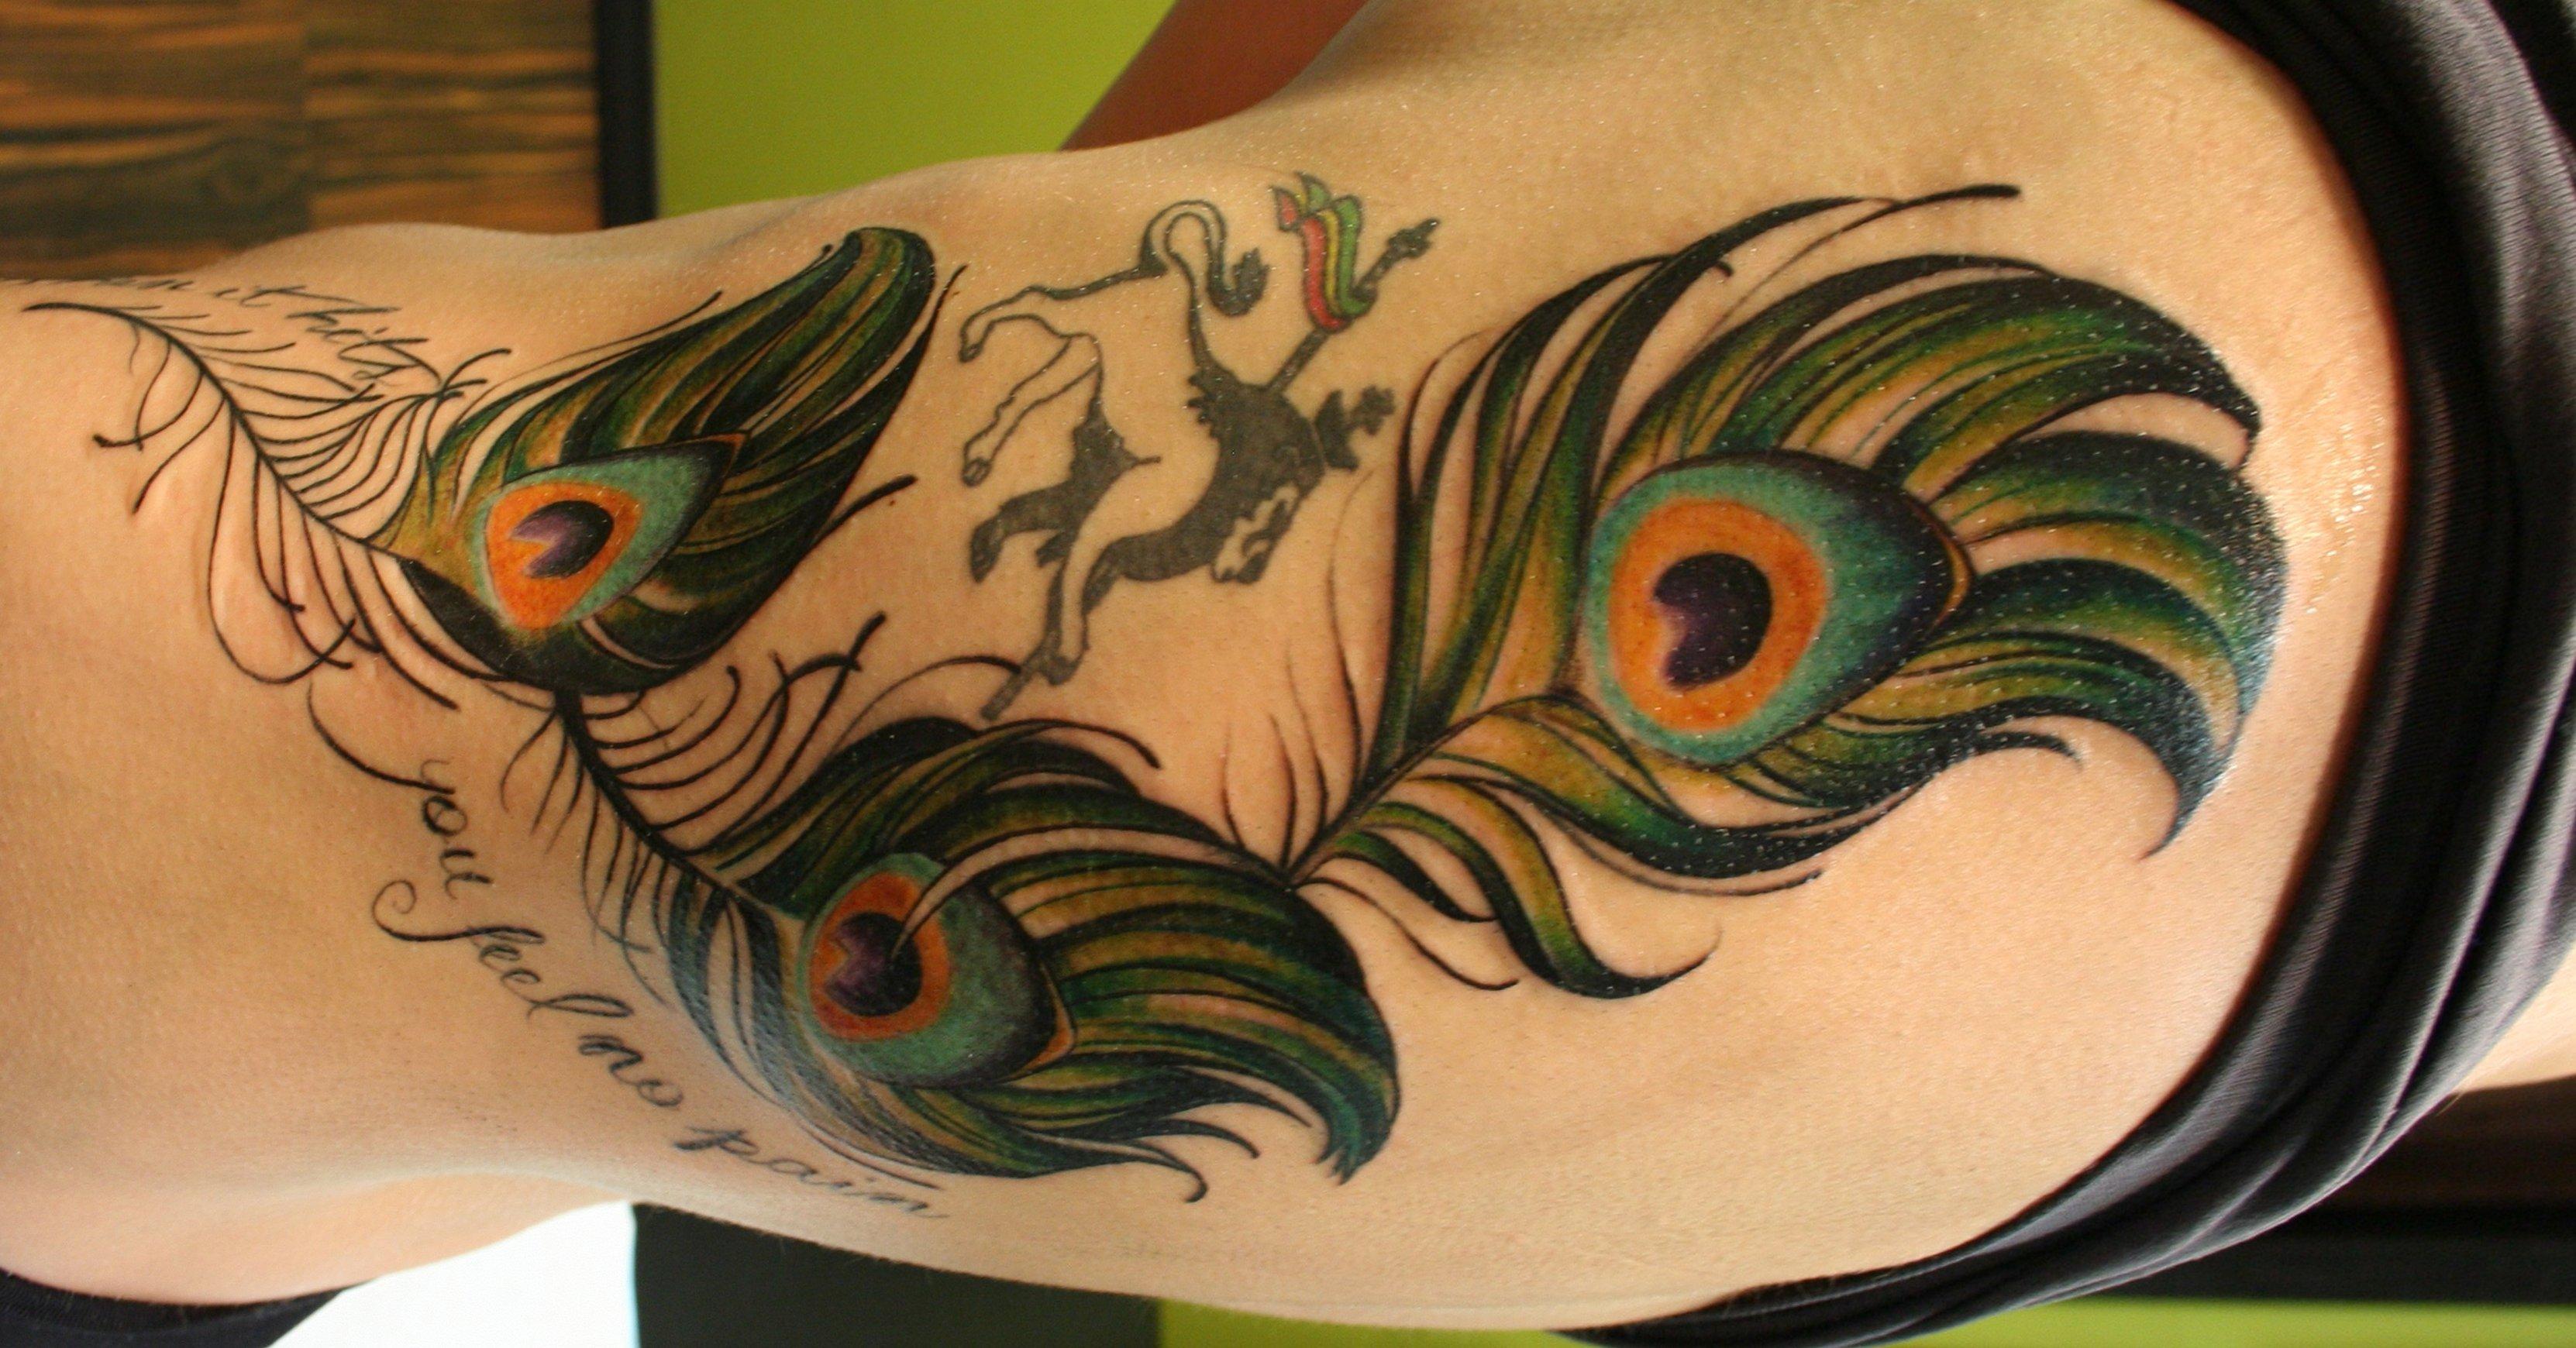 Pfau Tattoo Motive und Pfauenfeder Tattoo Bedeutung alletattoo.de 30